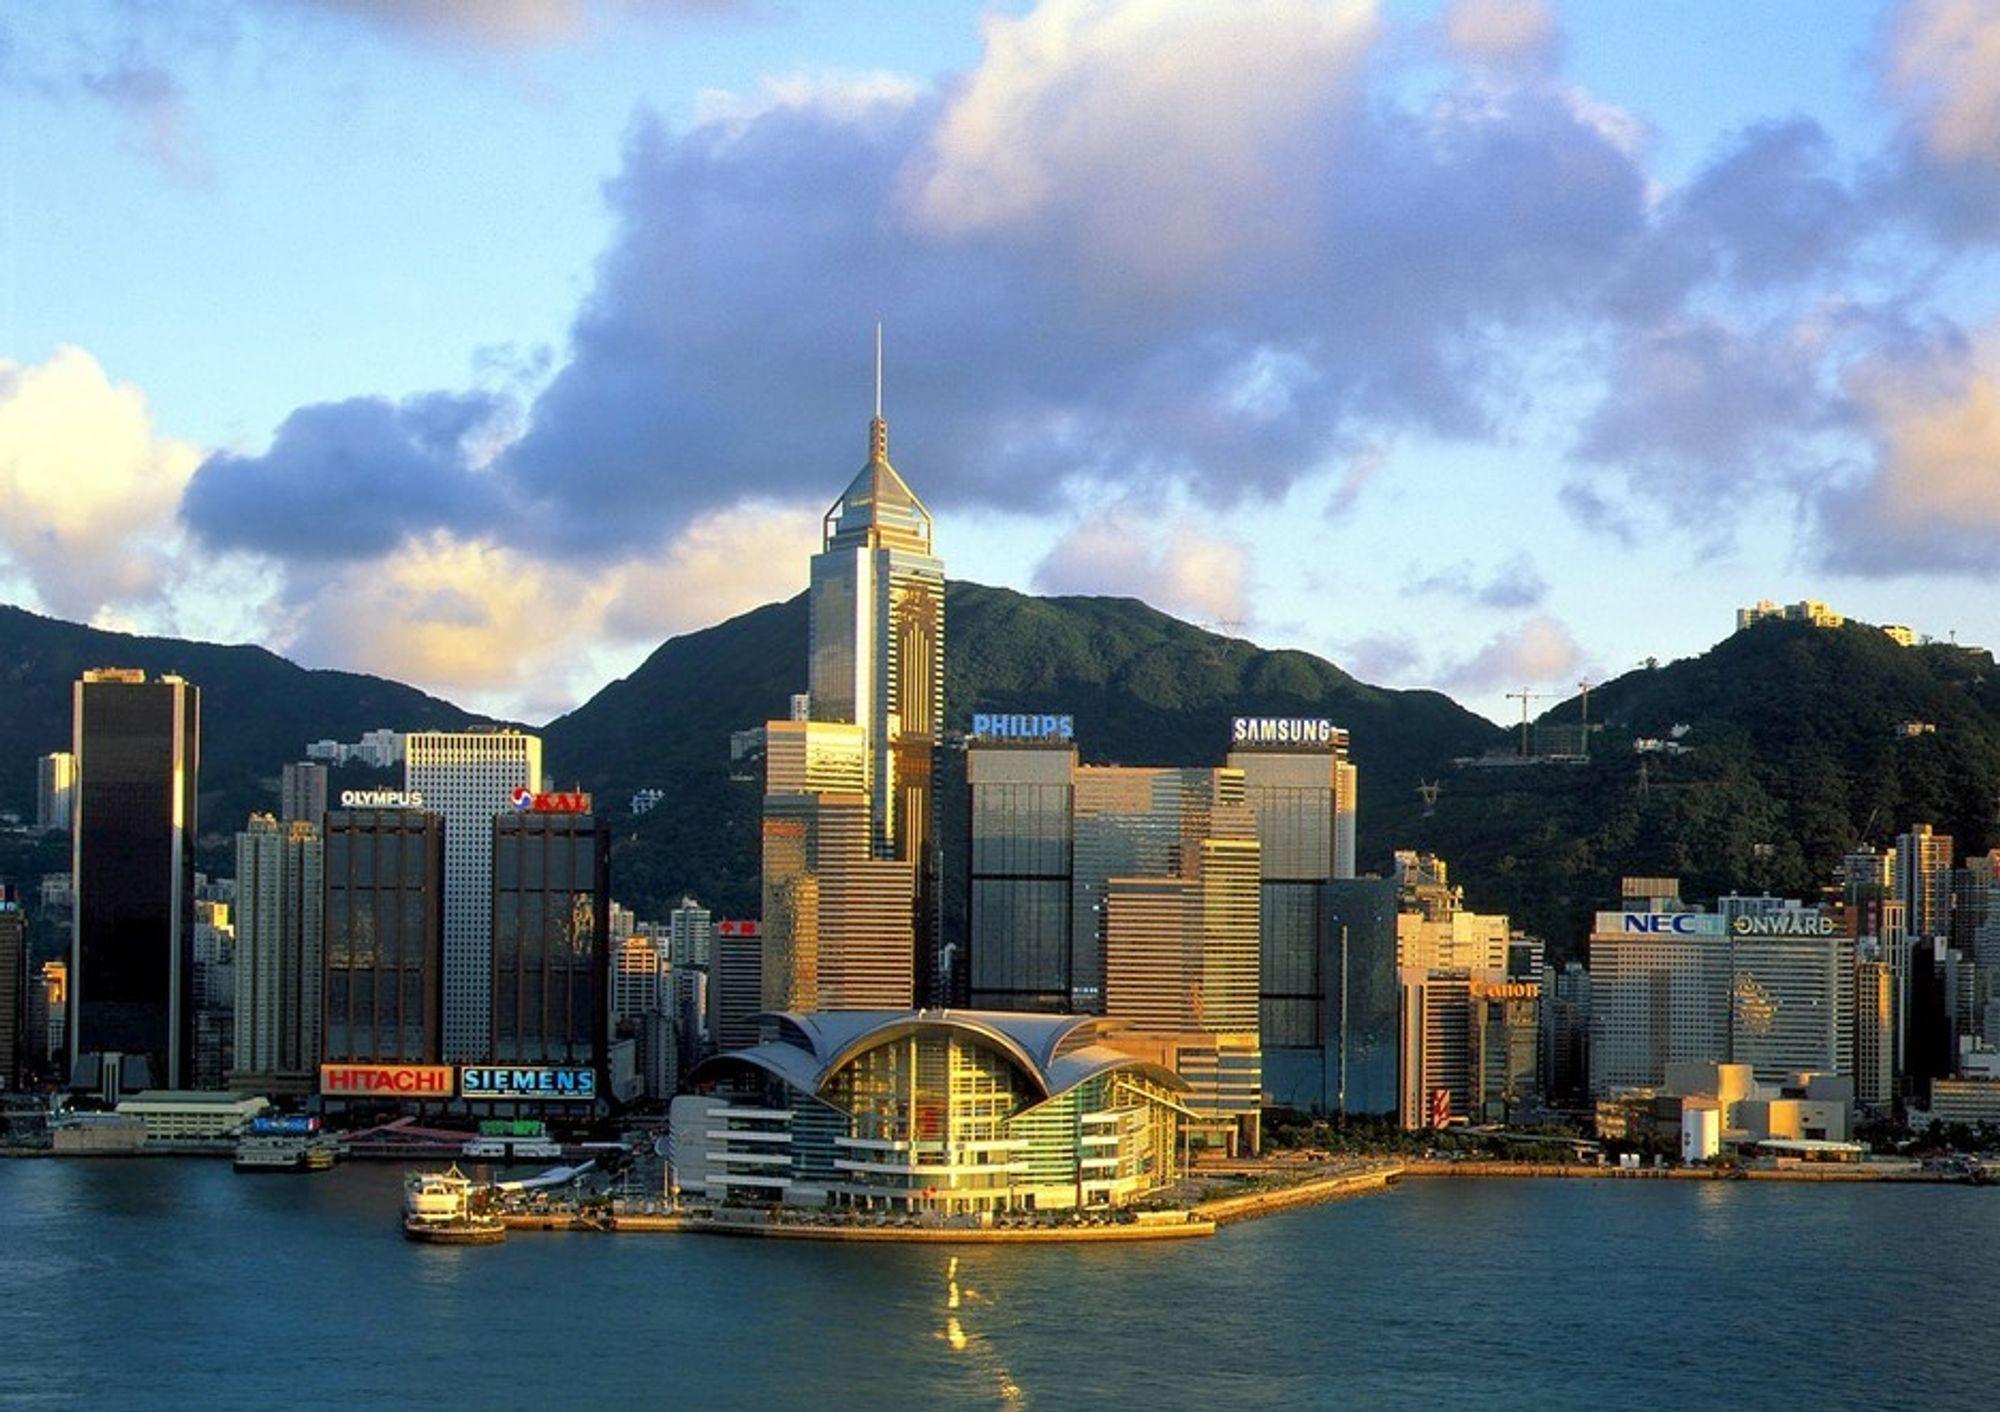 KLOAKKTUNNEL: Sintef deltar i et gedigent tunnelprosjekt i Hong Kong.